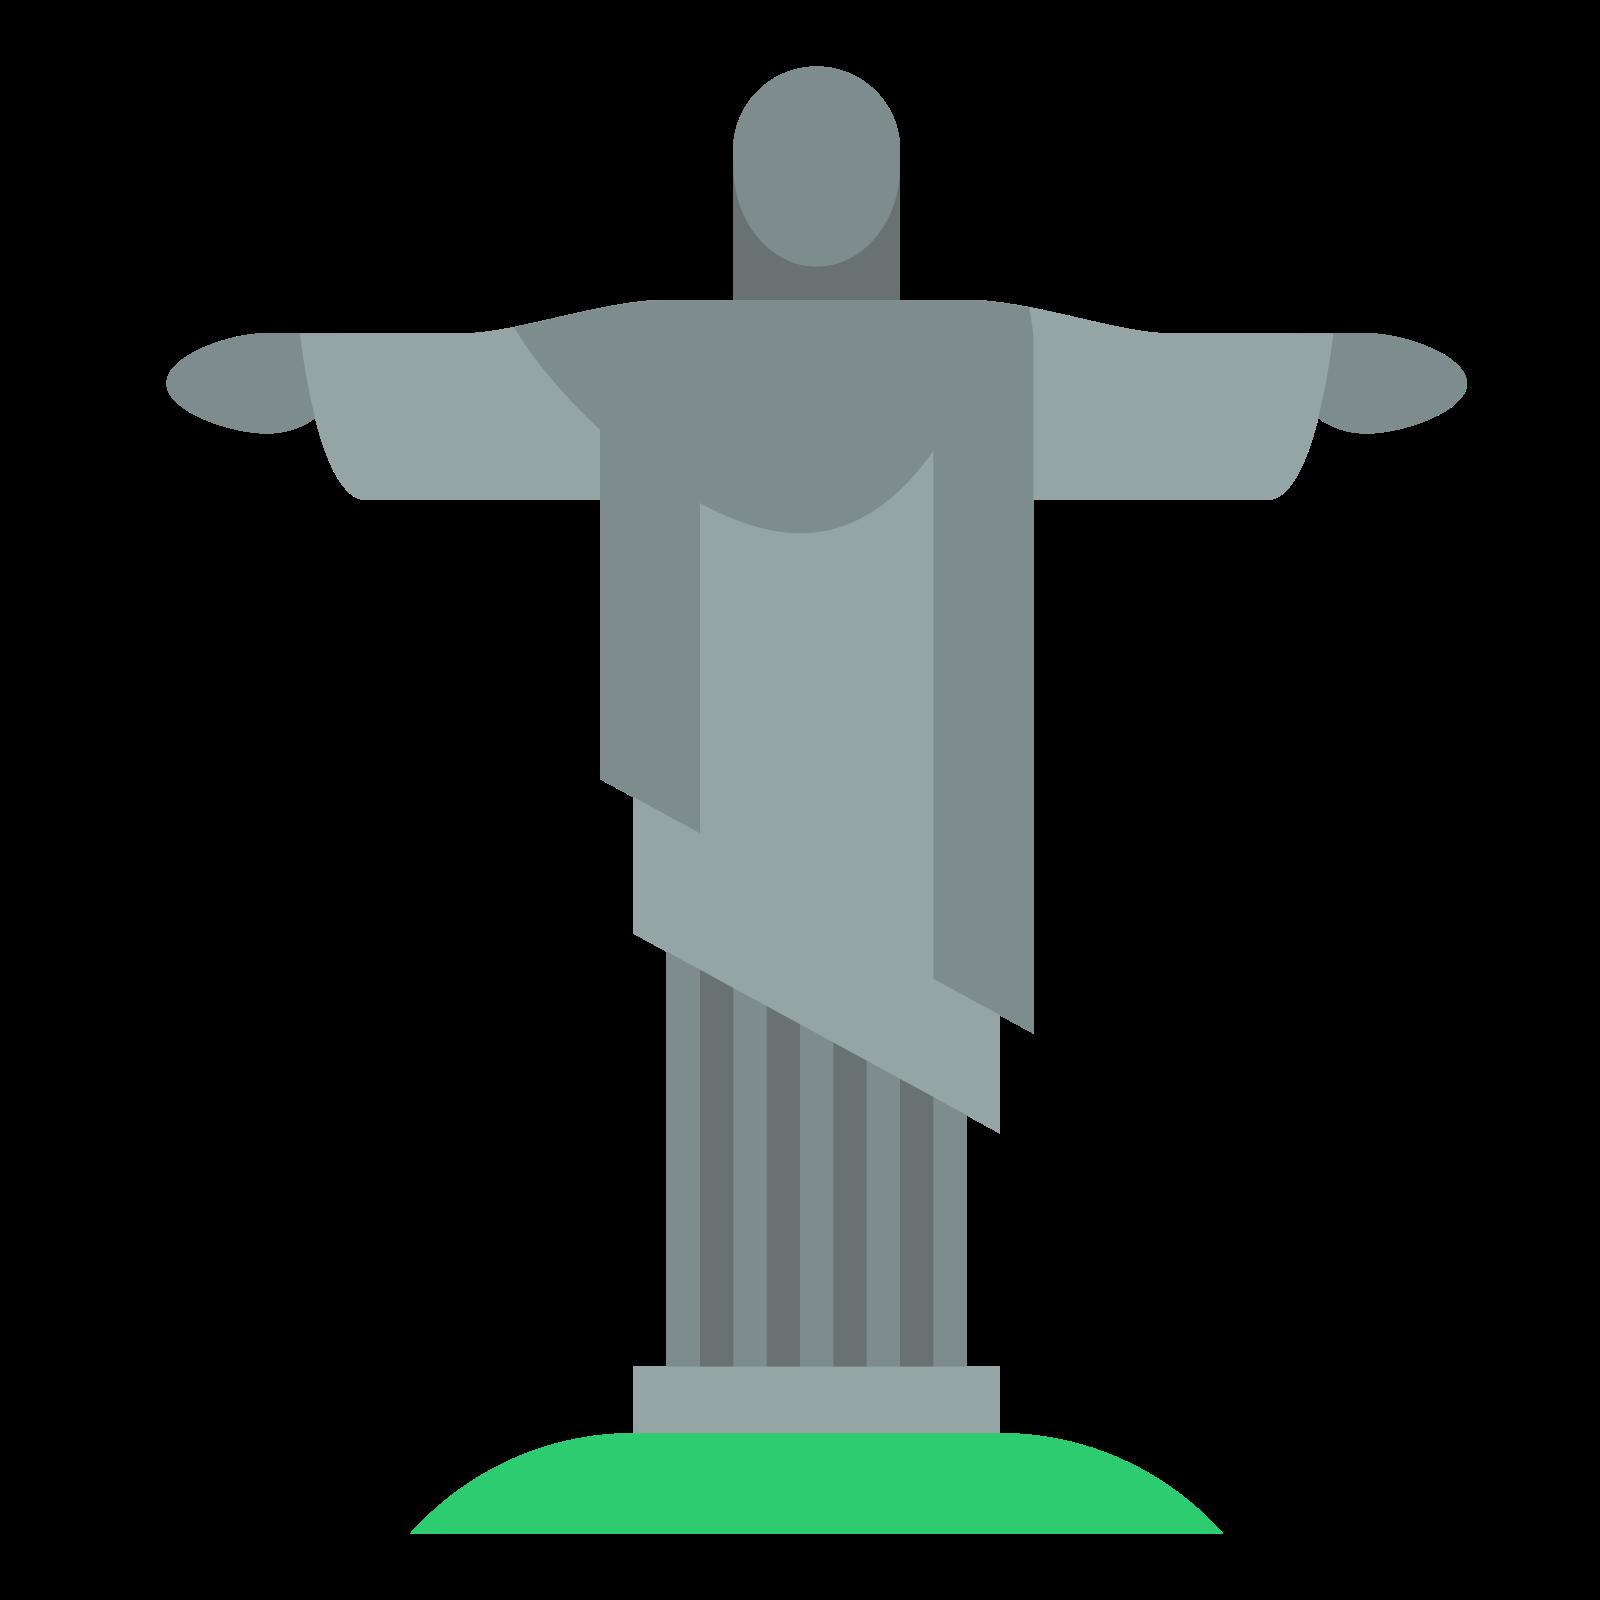 Pomnik Chrystusa Zbawiciela icon